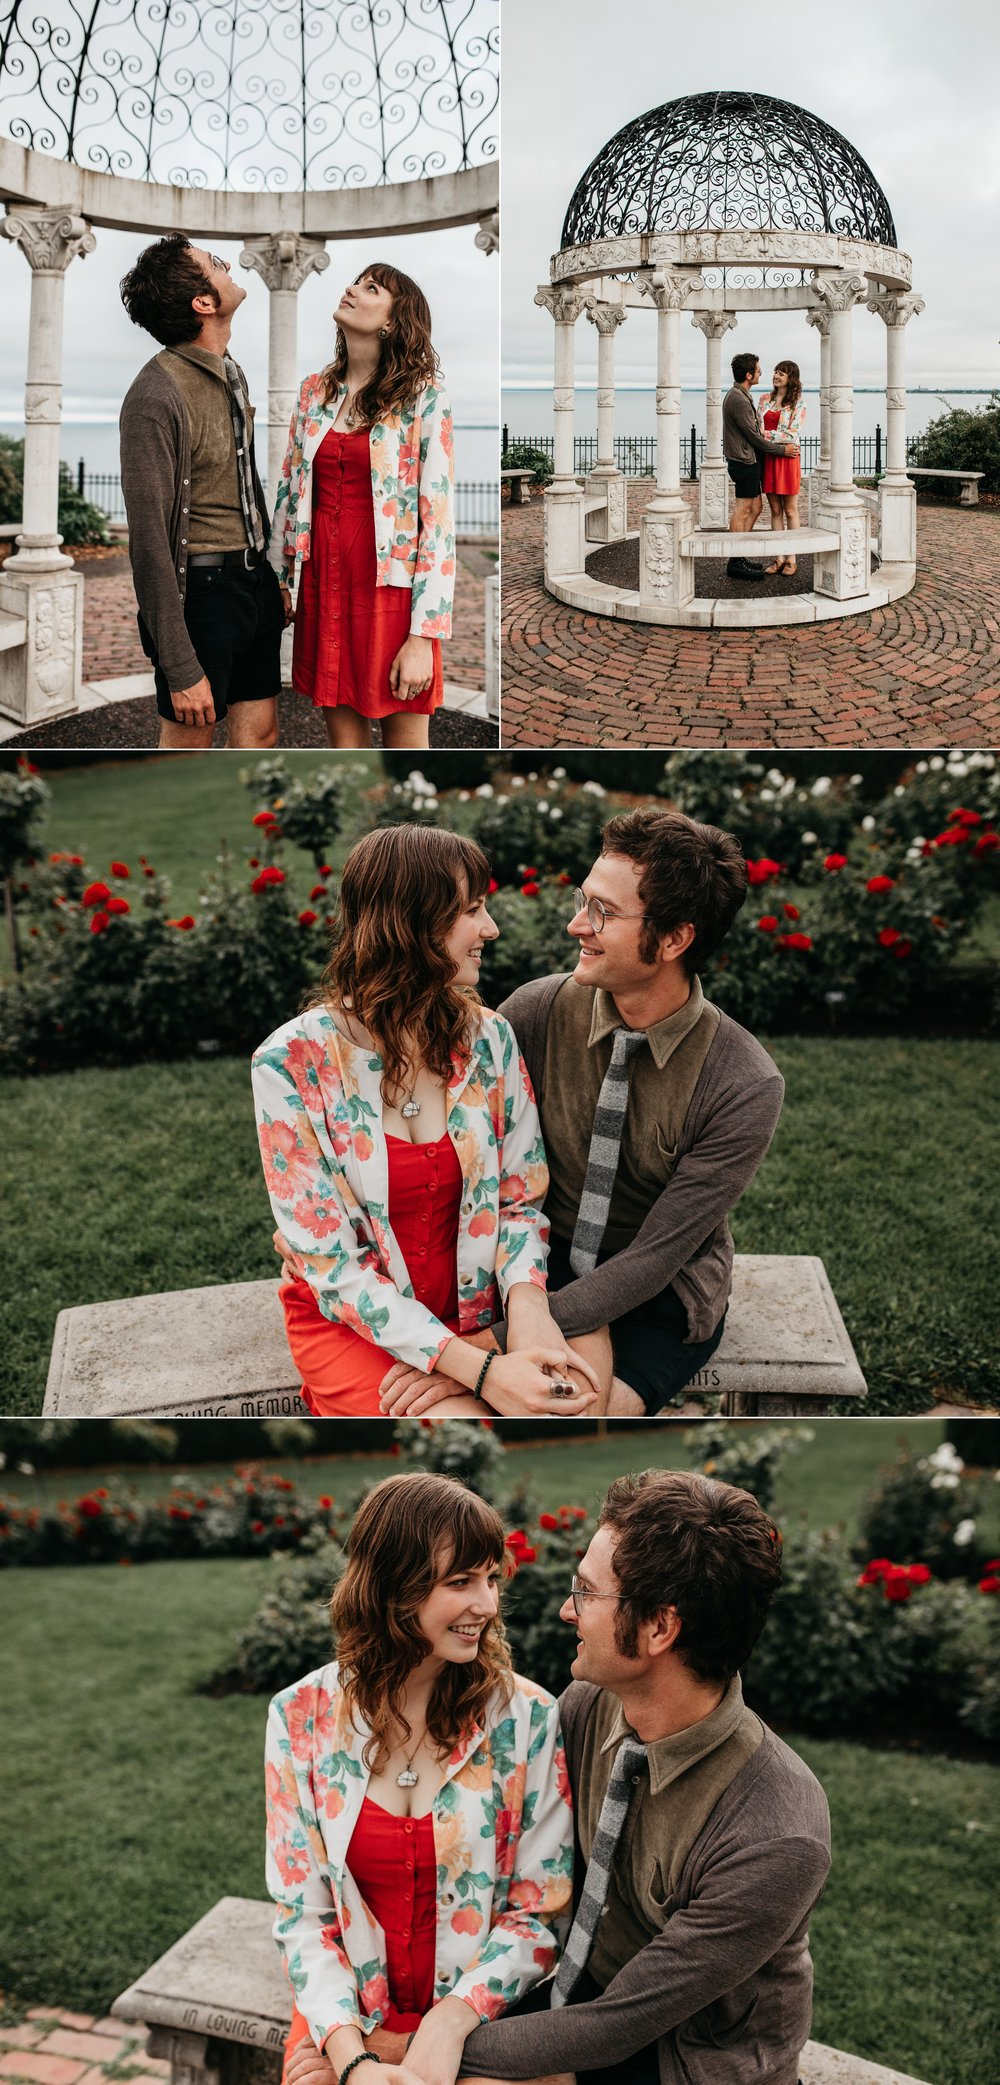 mandy aaron engagement minneapolis minnesota texas austin wedding elopement destination intimate best photographer_0147.jpg